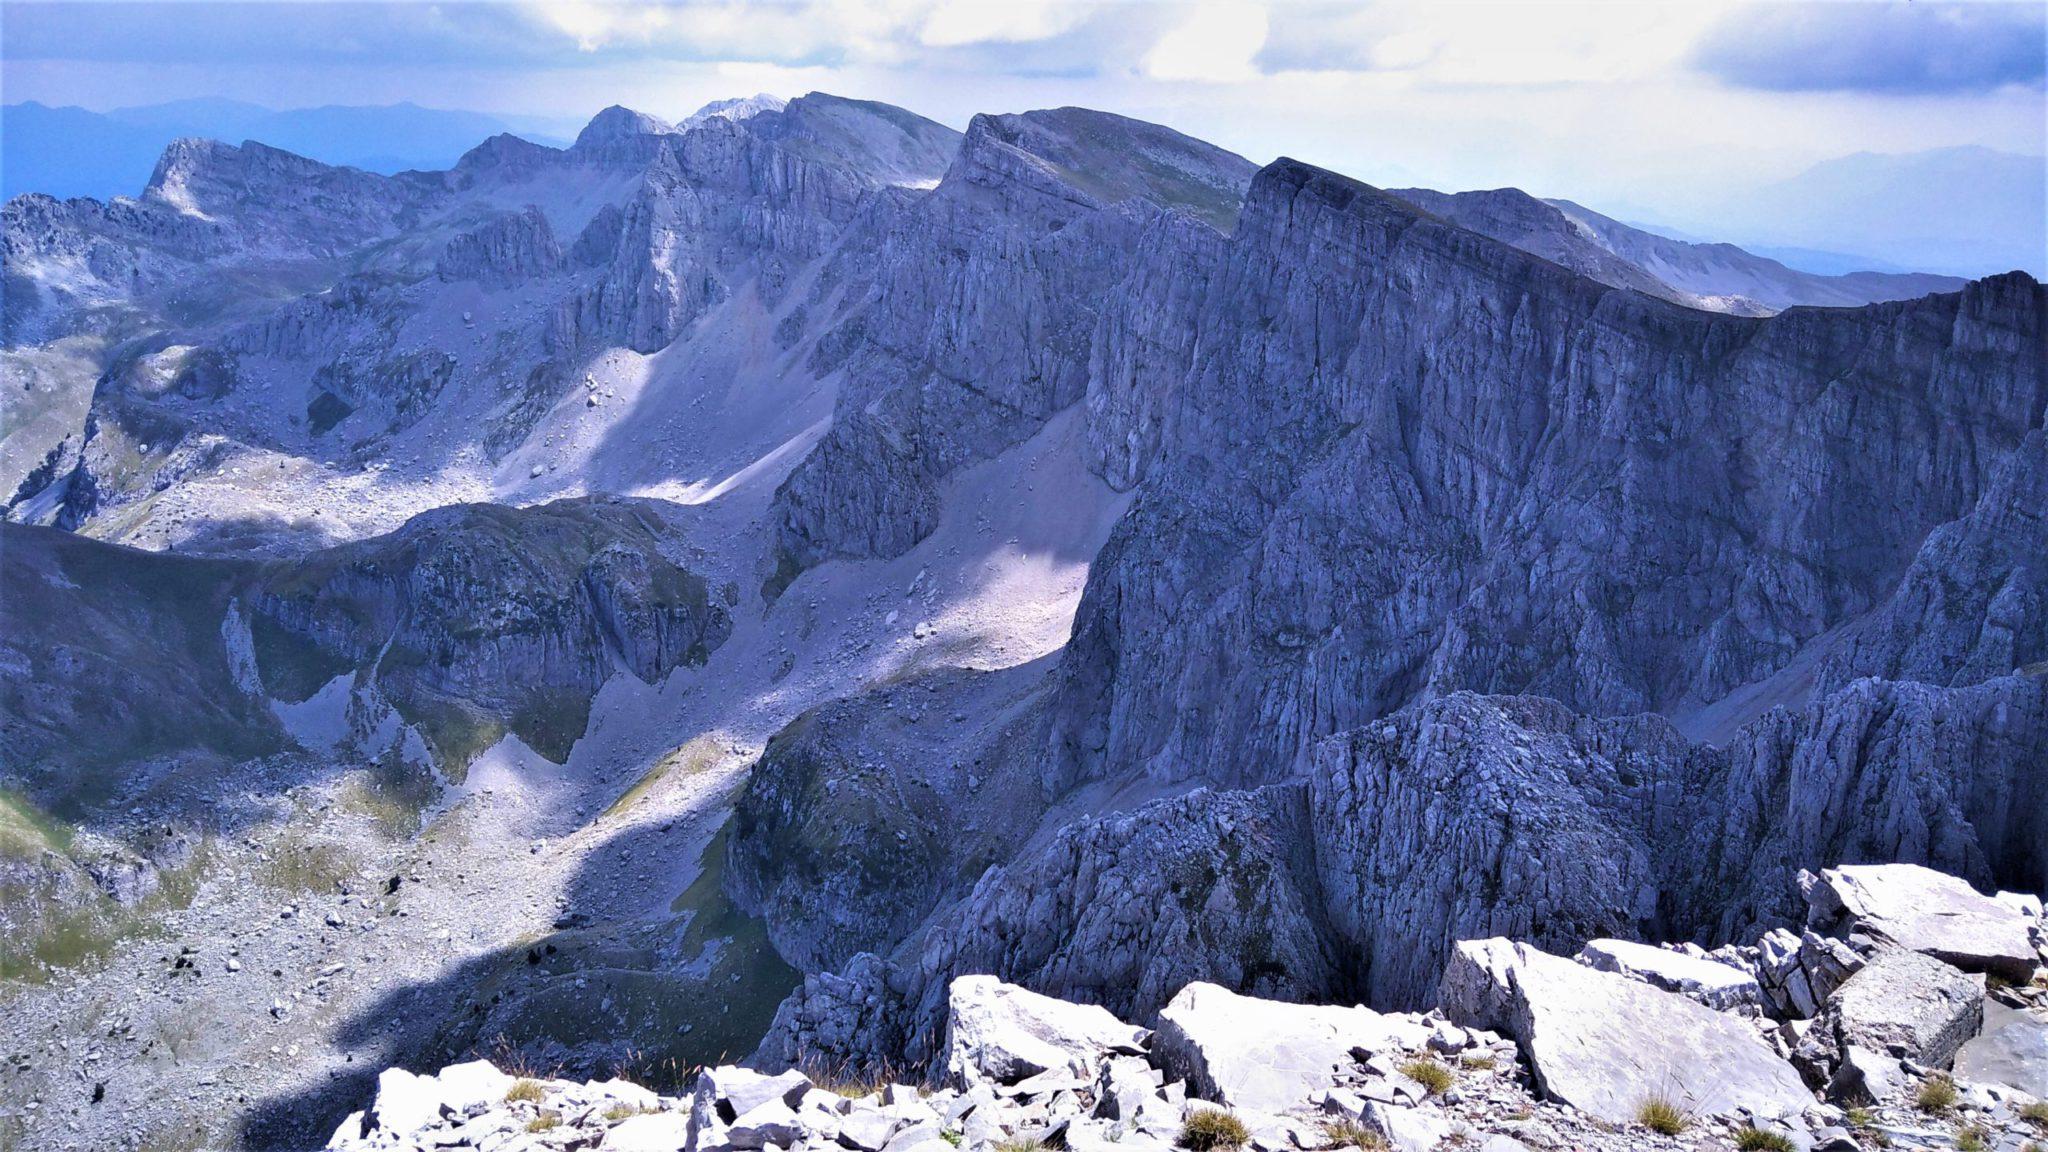 Northern Greece trekking holiday: Trek the Pindus Mountains